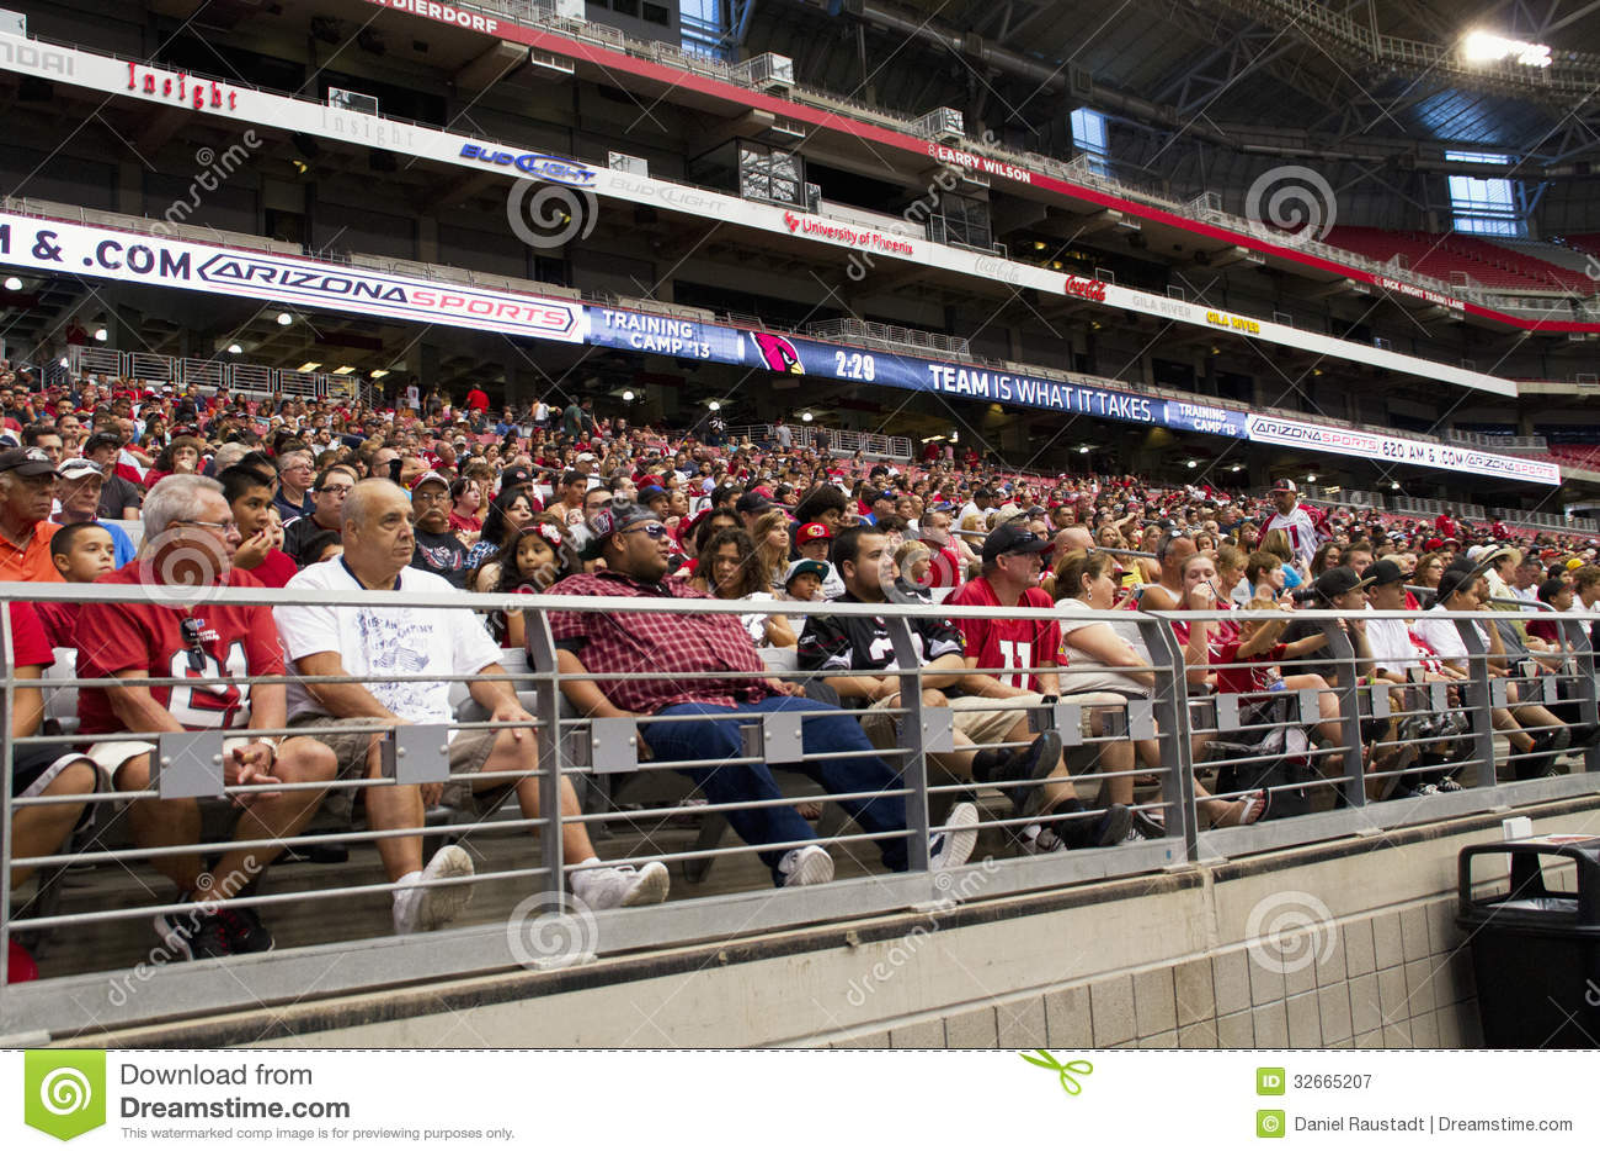 NFL Arizona Cardinals football team training camp fans